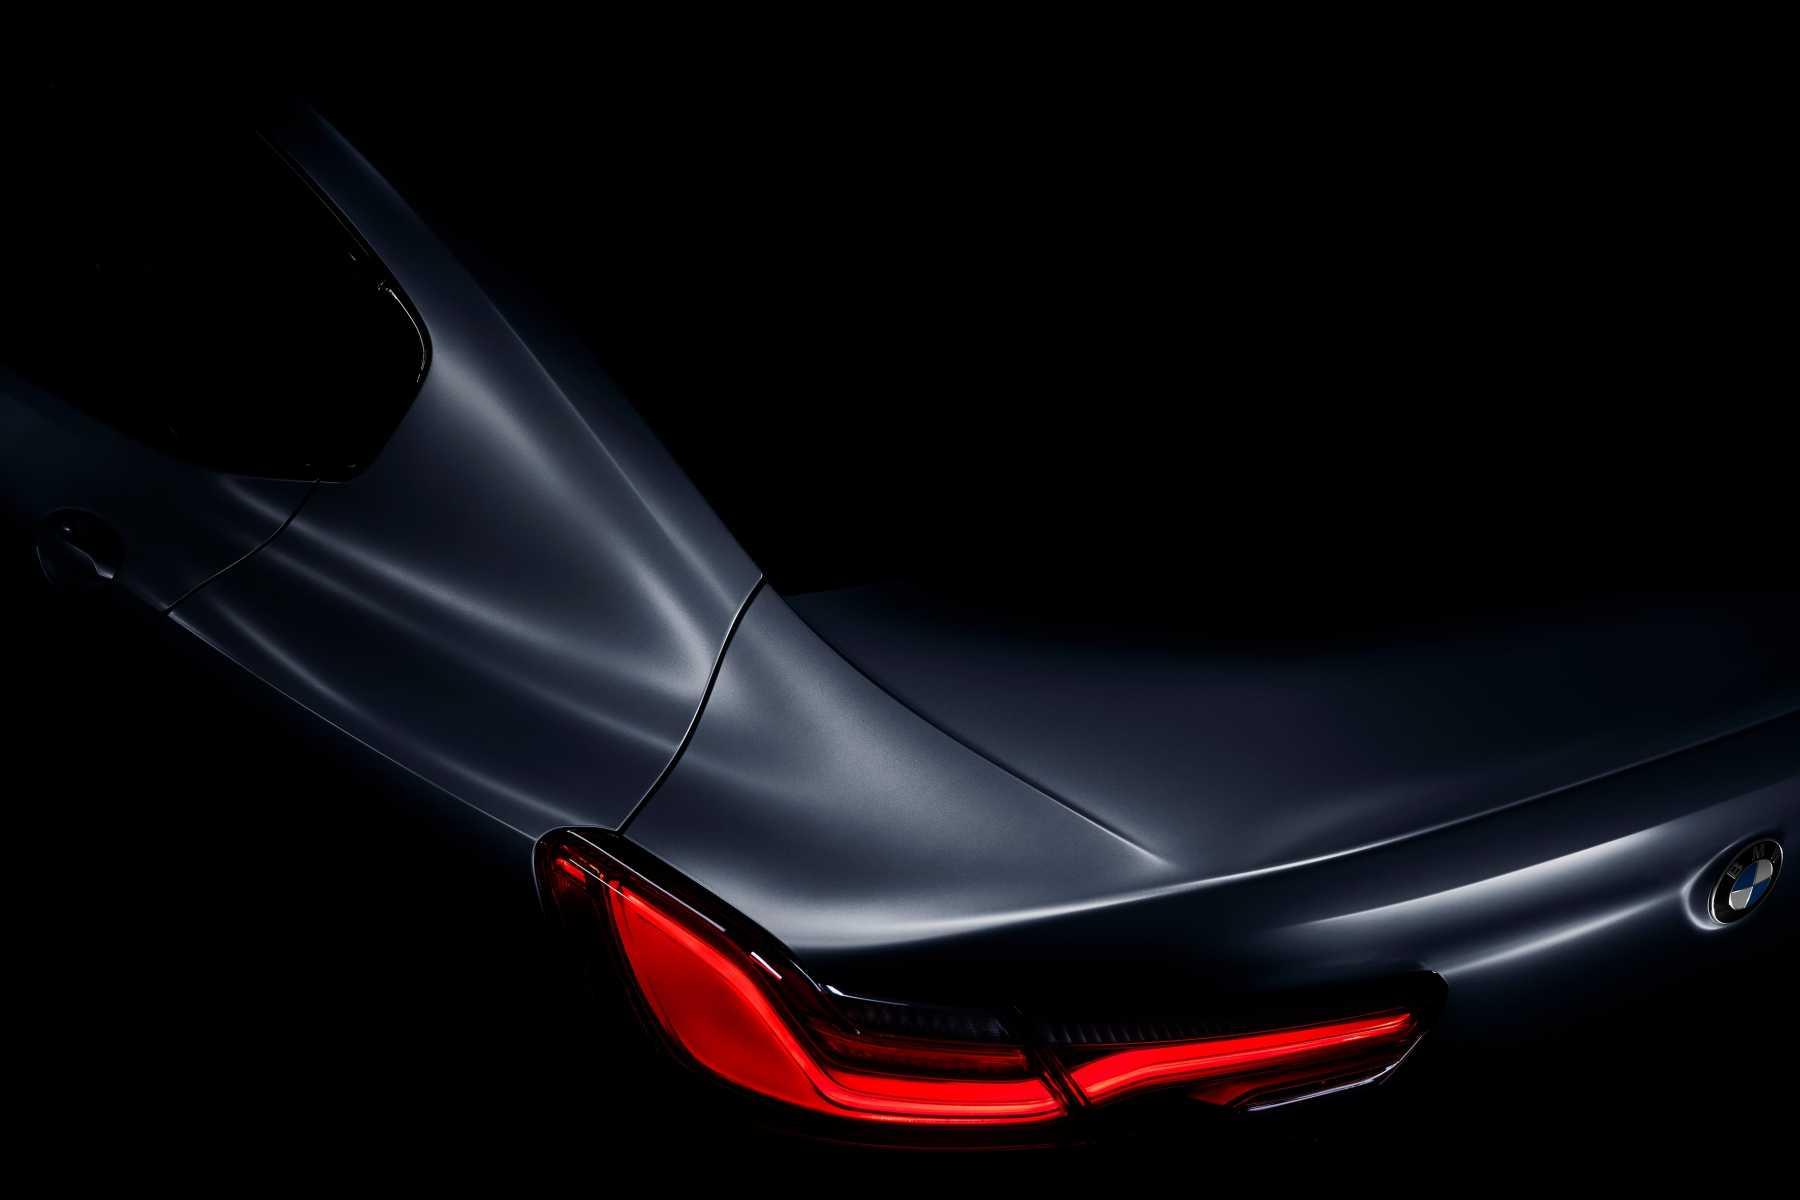 8 series Gran Coup Teaser rear profile 3543x2362